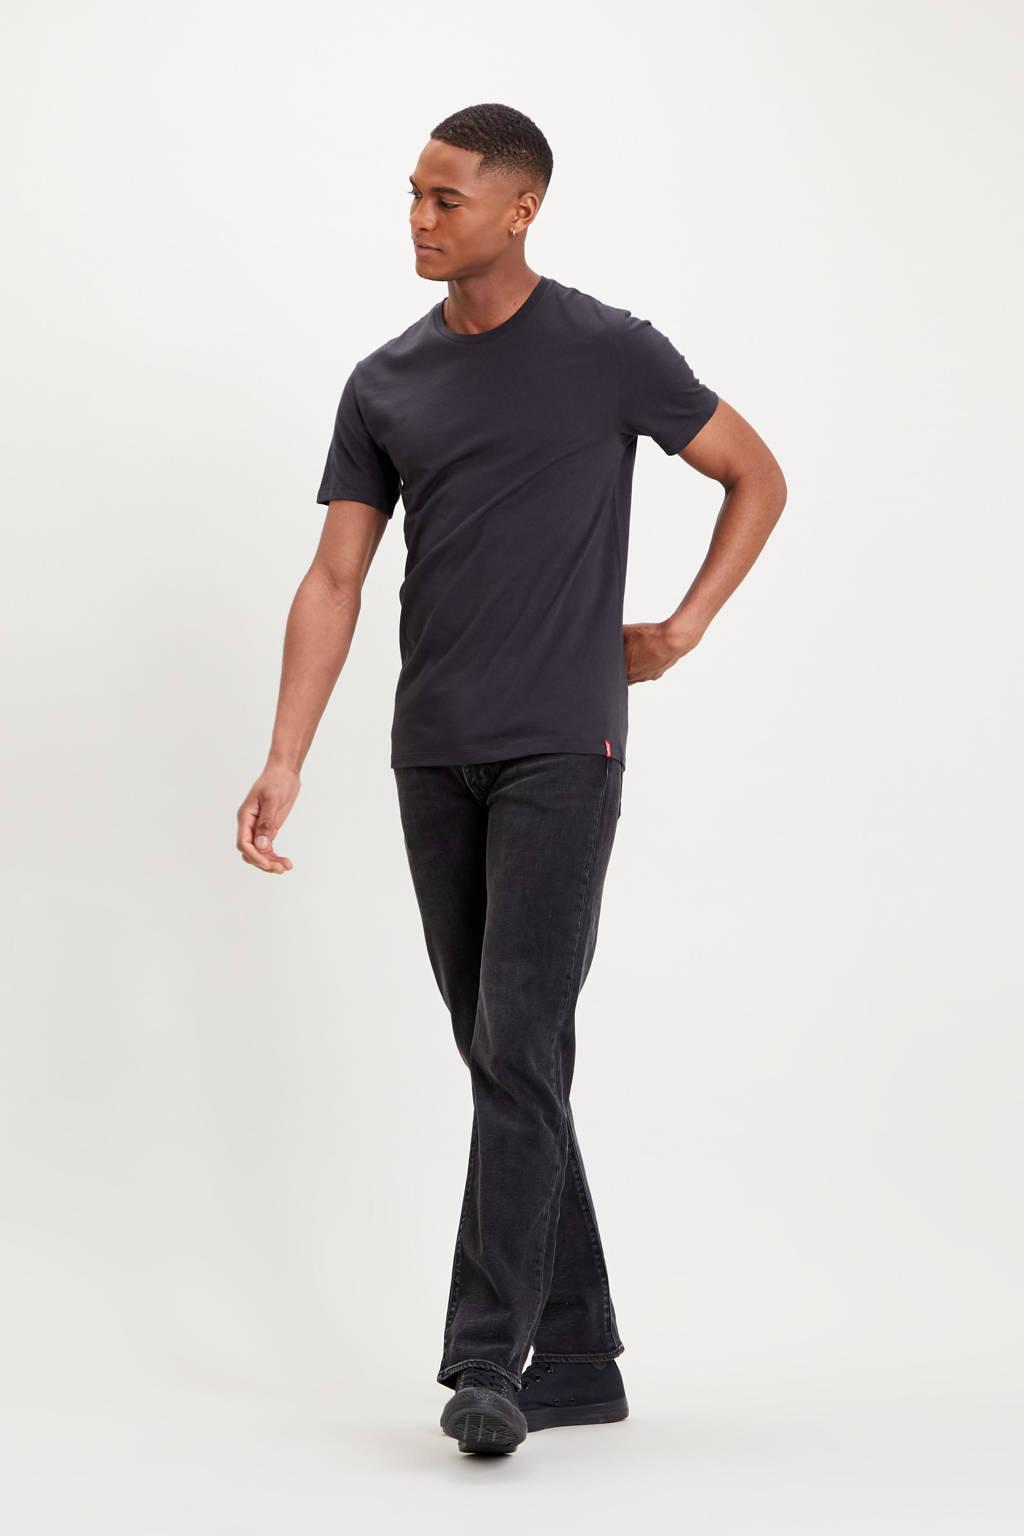 Levi's straight fit jeans caboose adv, CABOOSE ADV